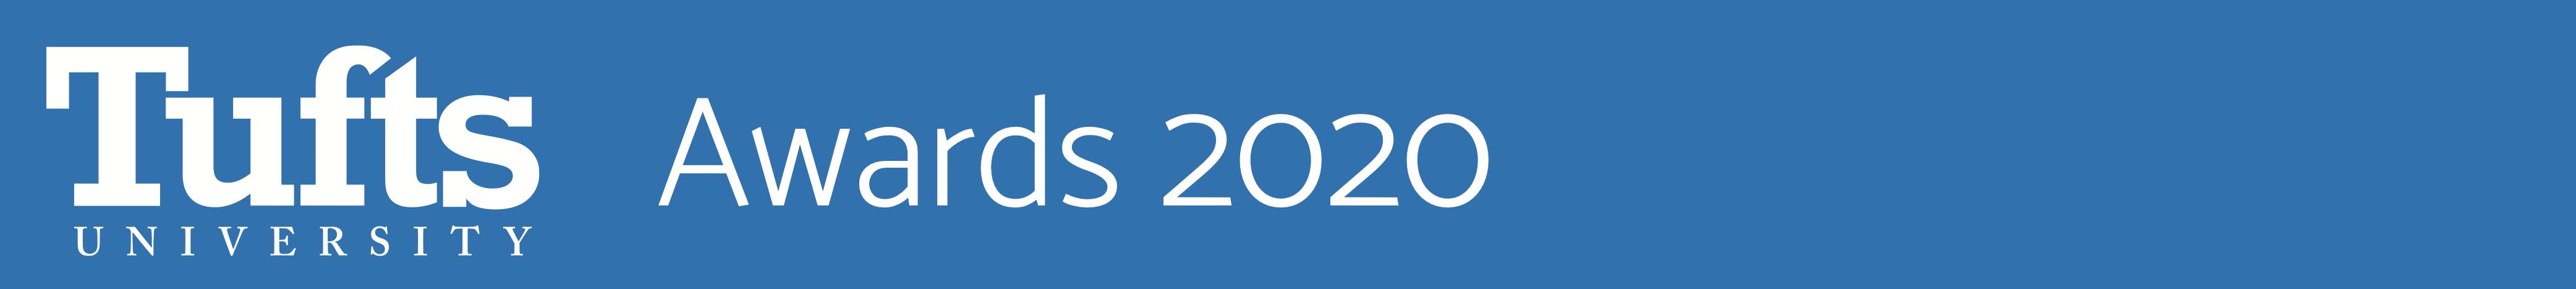 Tufts Awards 2020